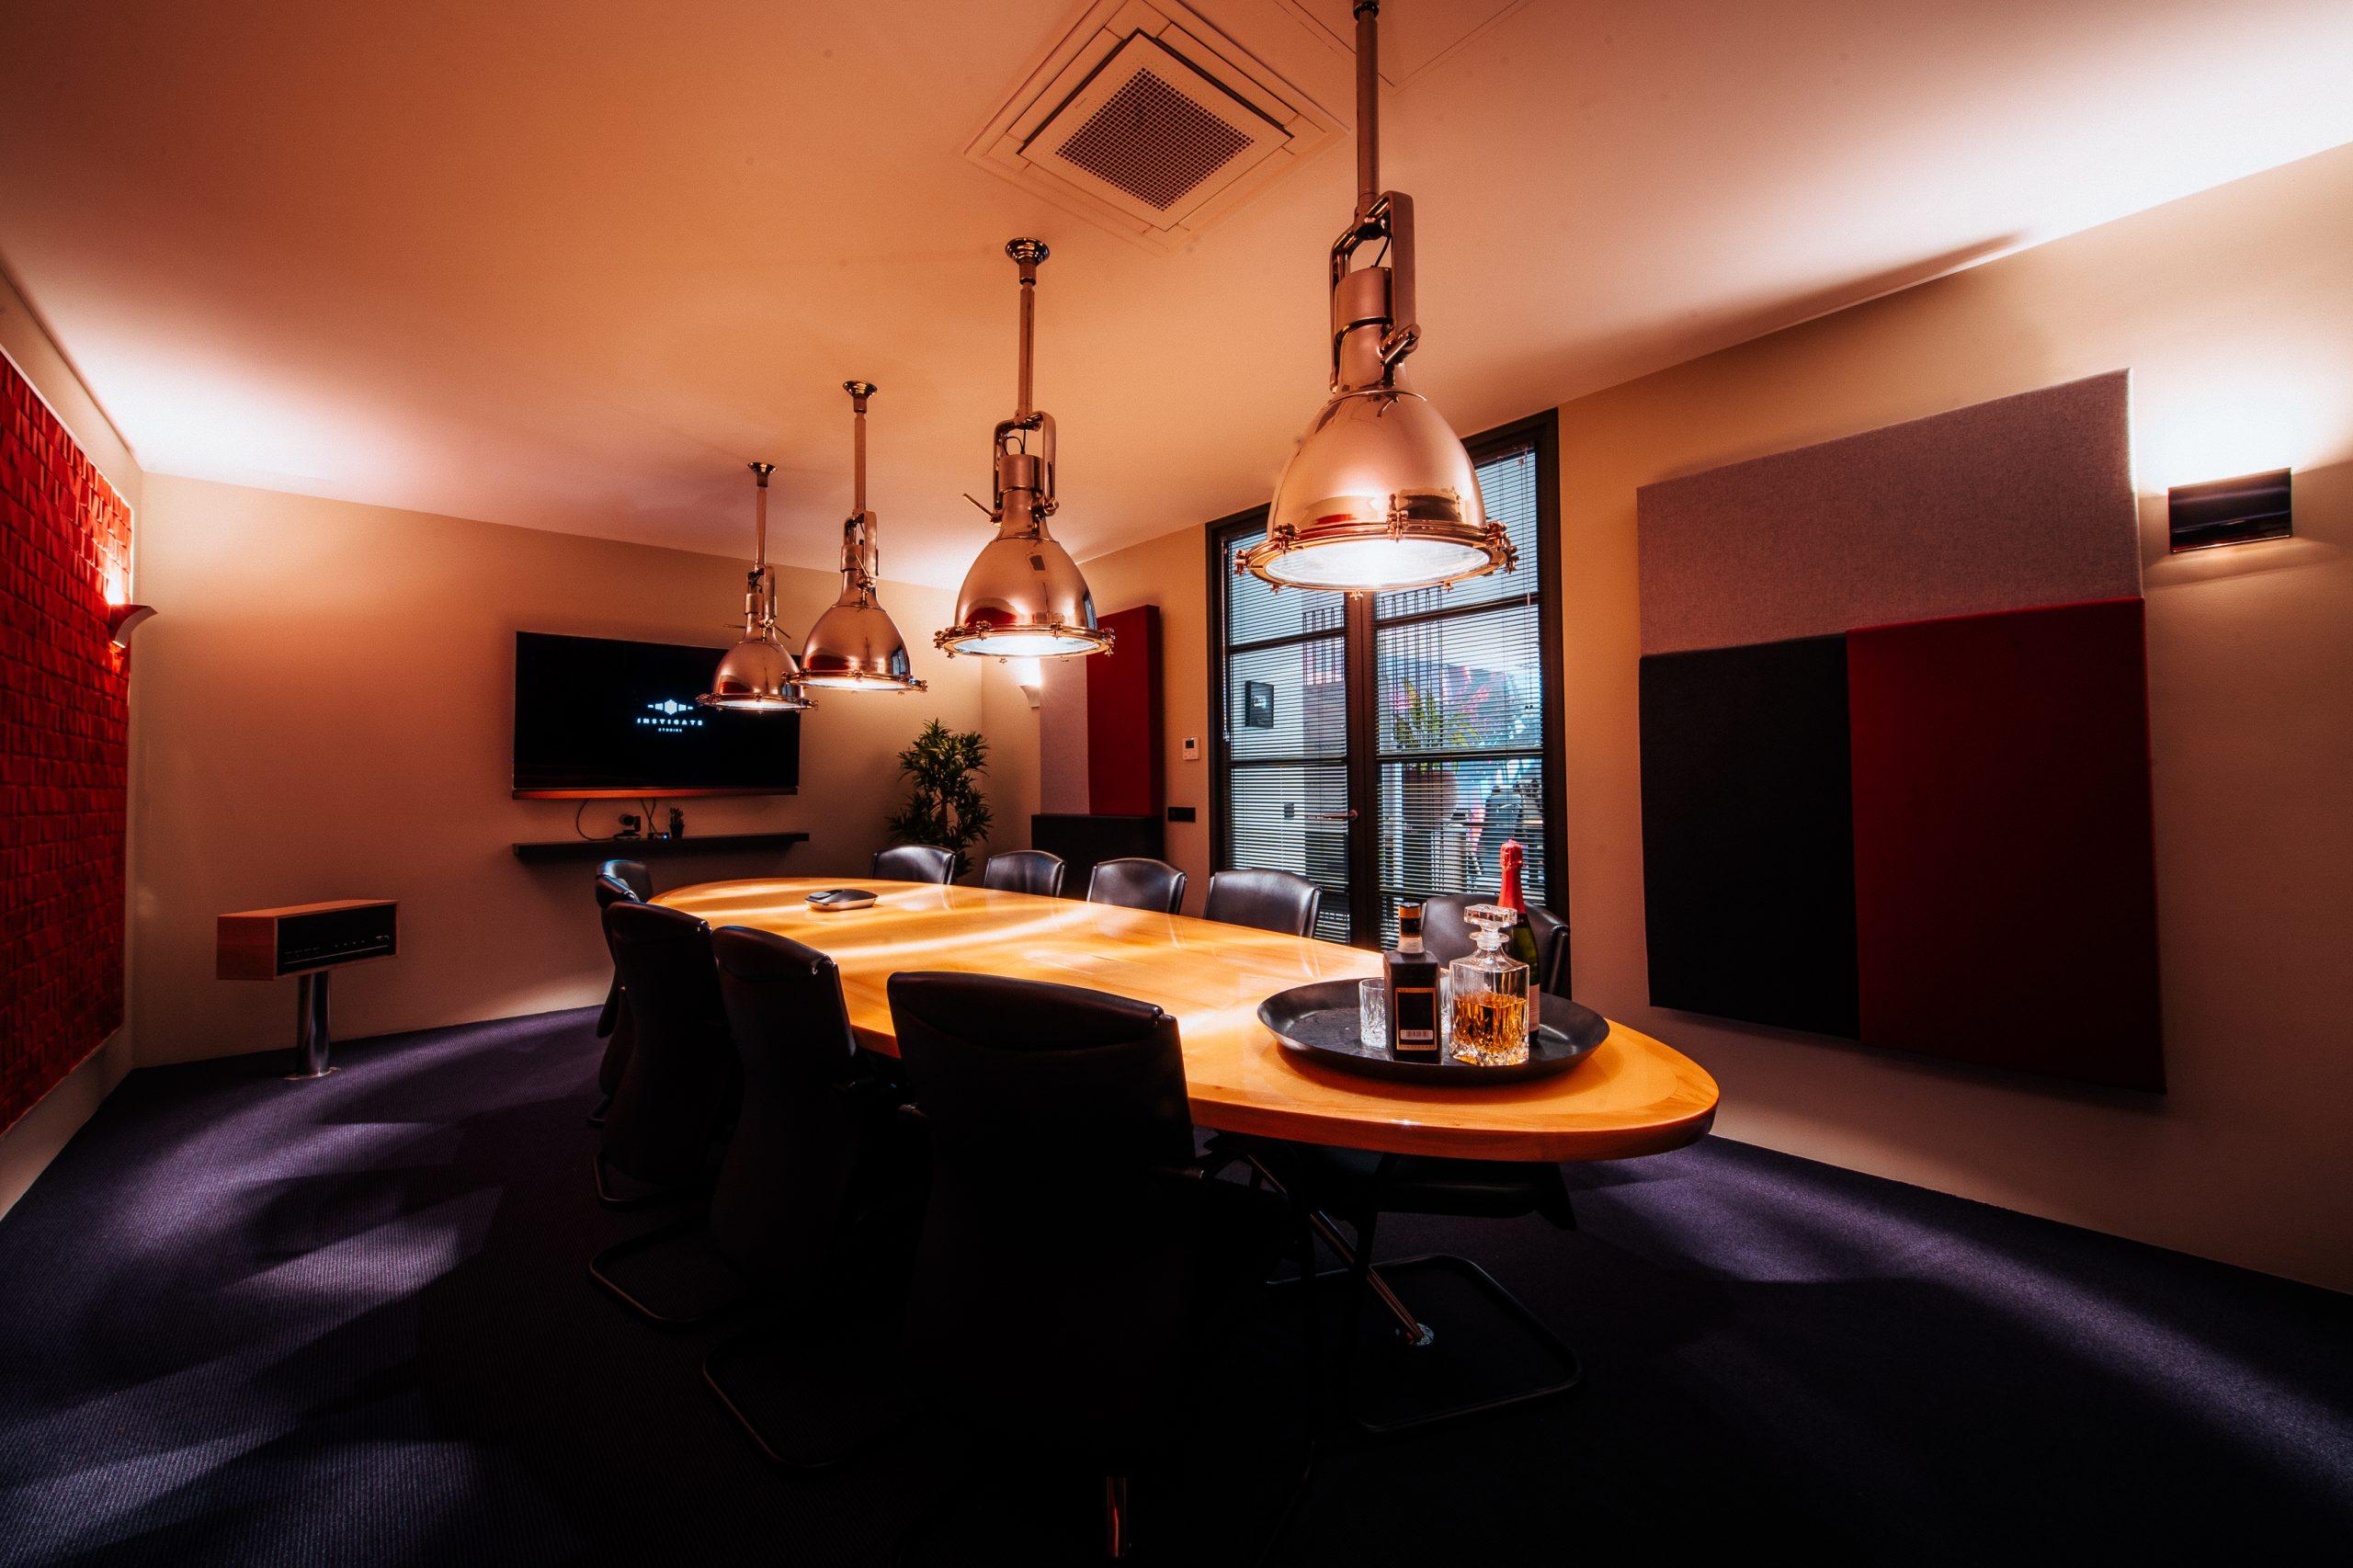 Instigate Studios get in touch